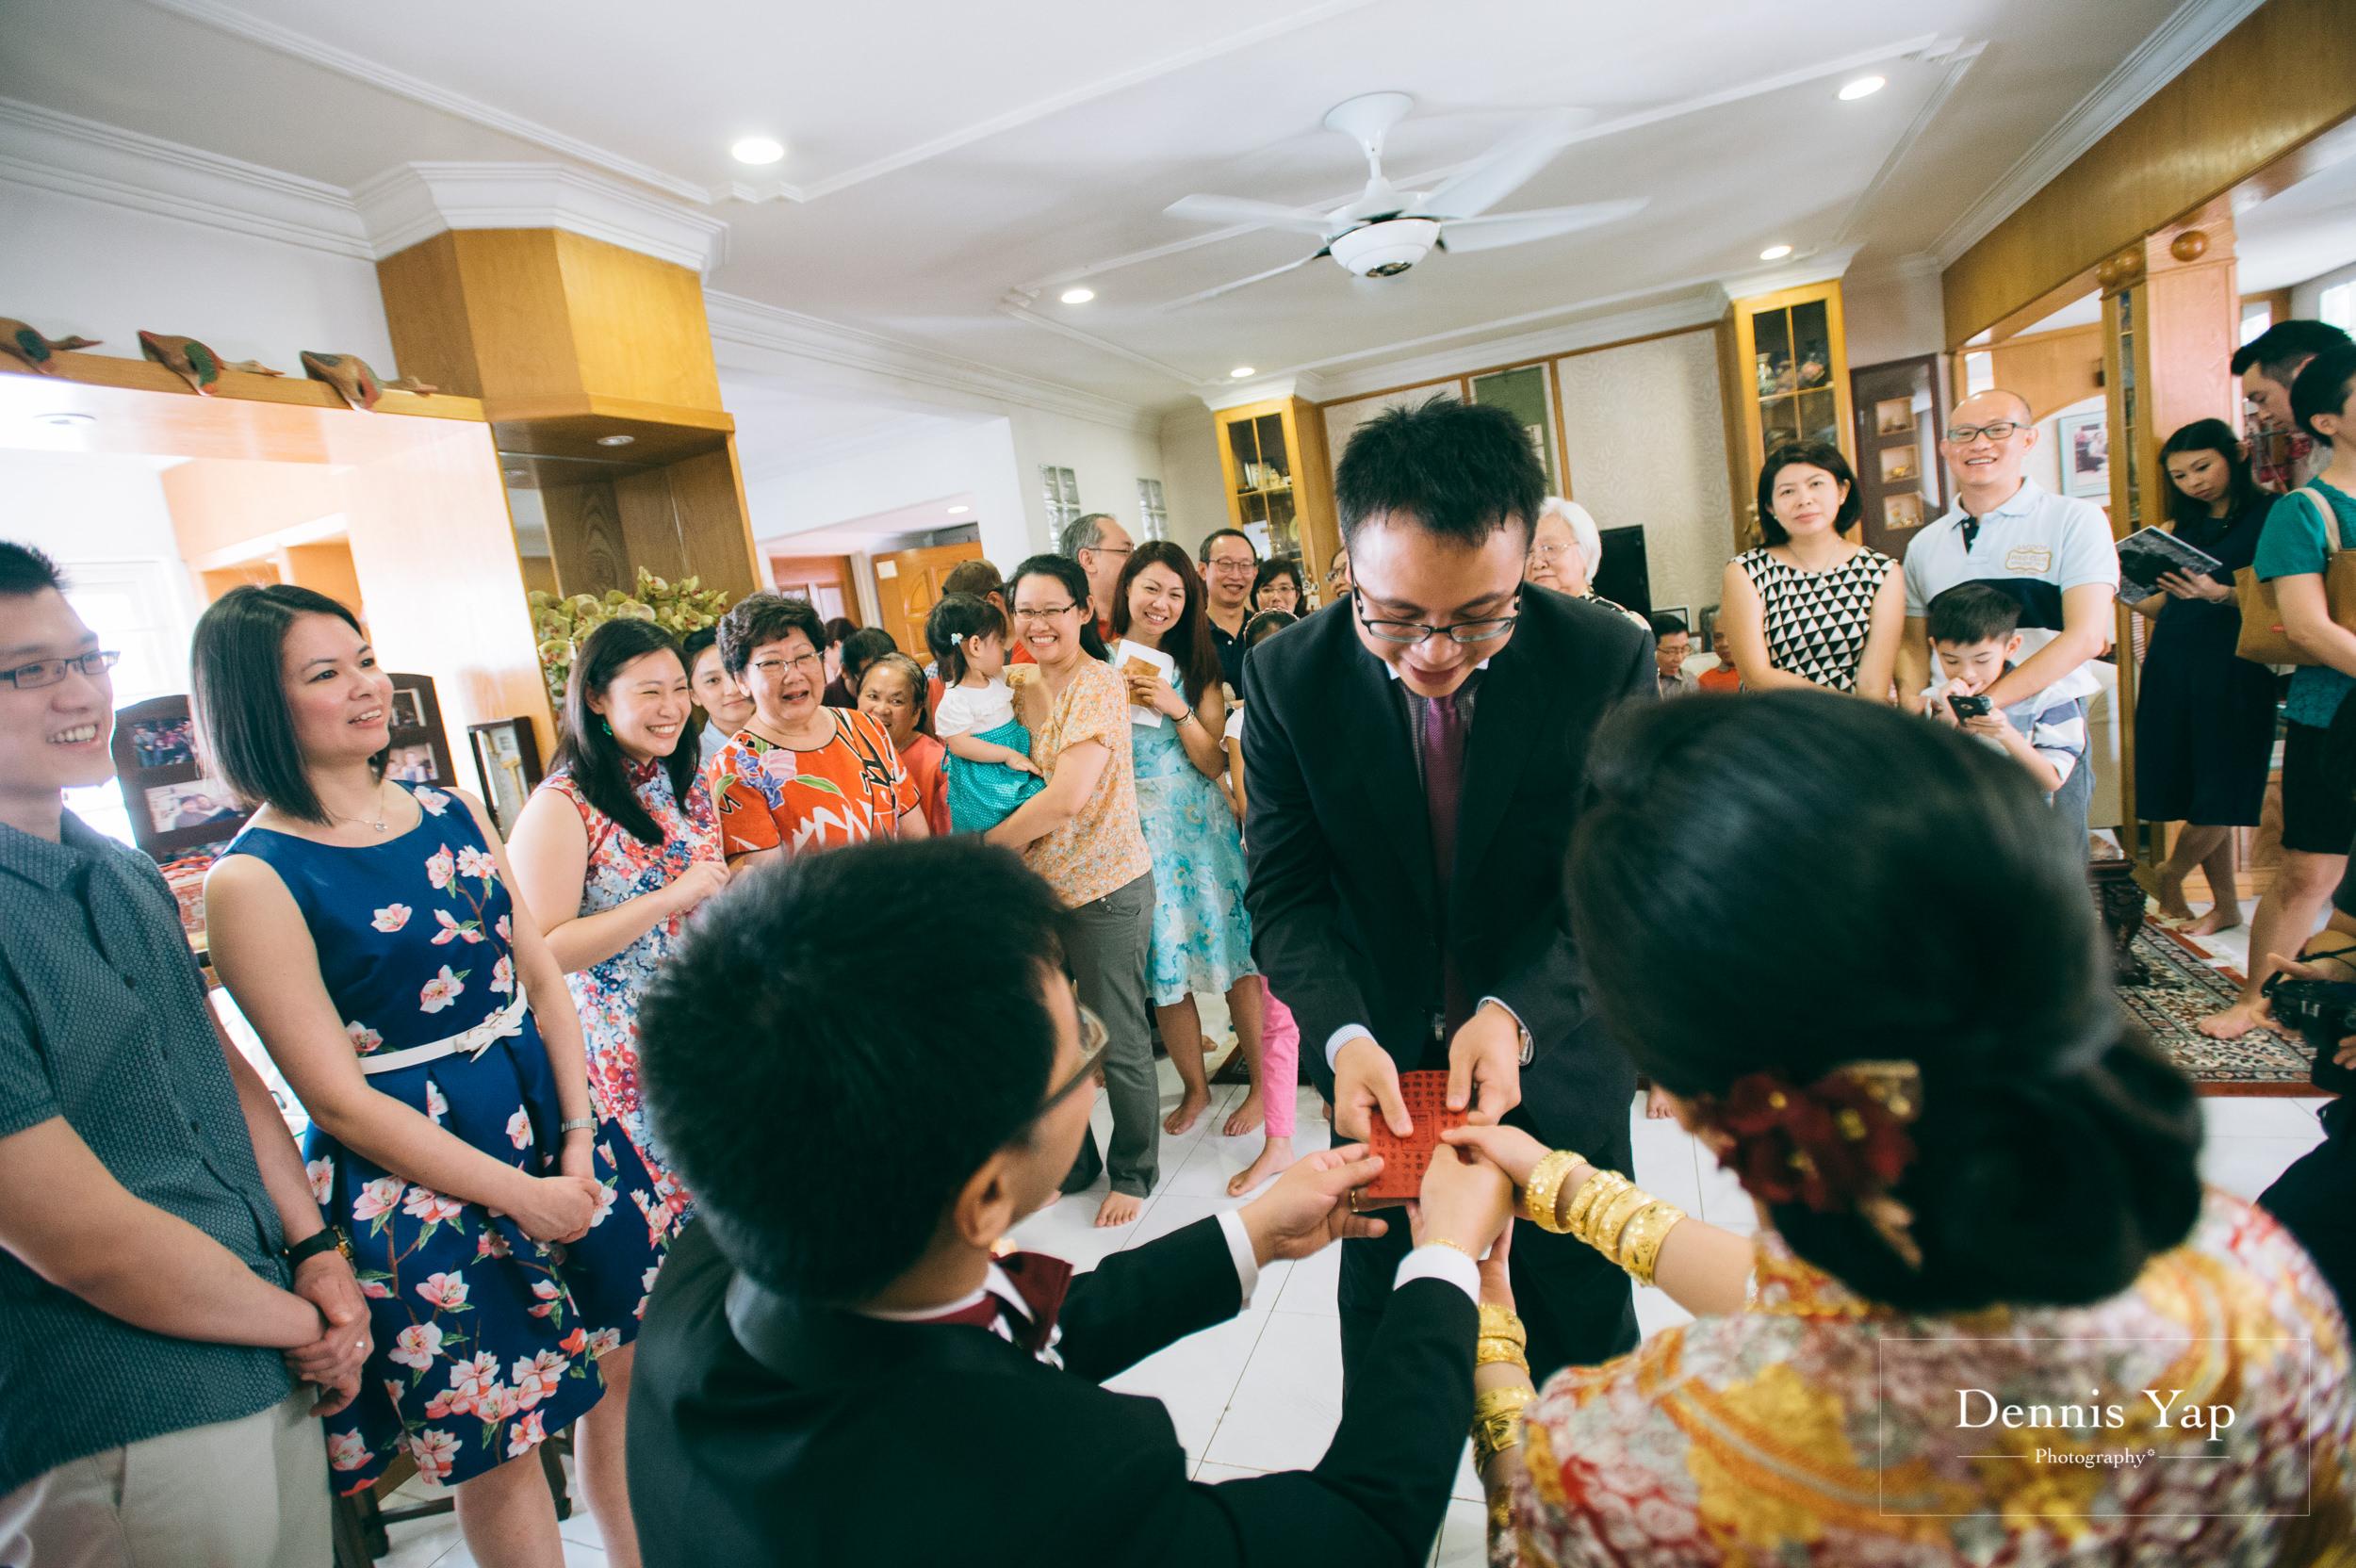 wai keong jenny wedding day bangsar dennis yap photography emotions beloved family-23.jpg